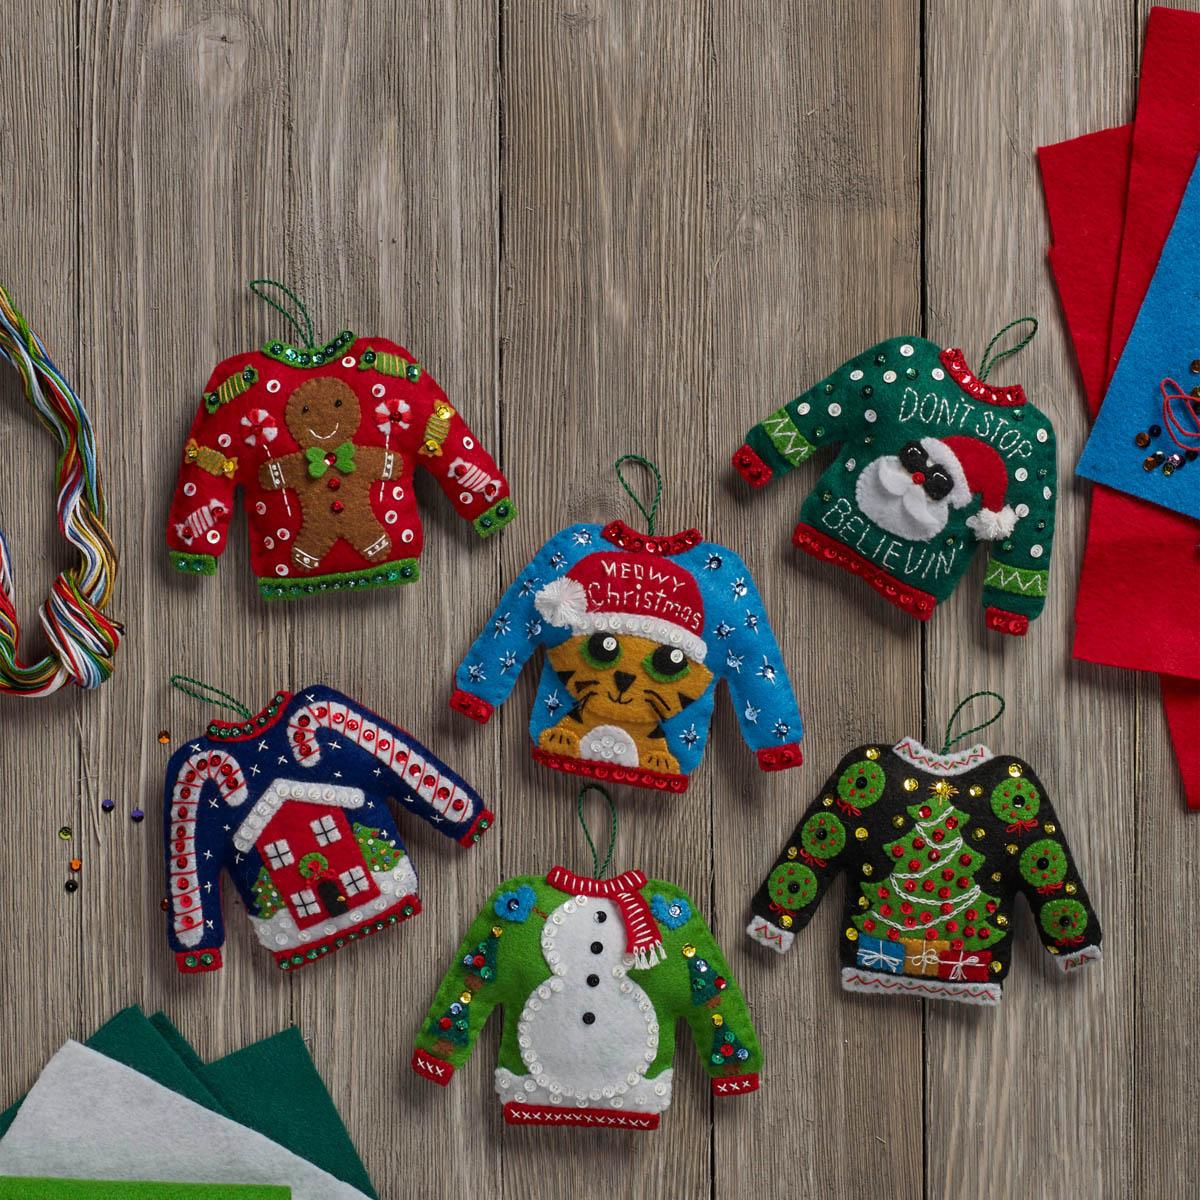 Bucilla ® Seasonal - Felt - Ornament Kits - Ugly Sweaters